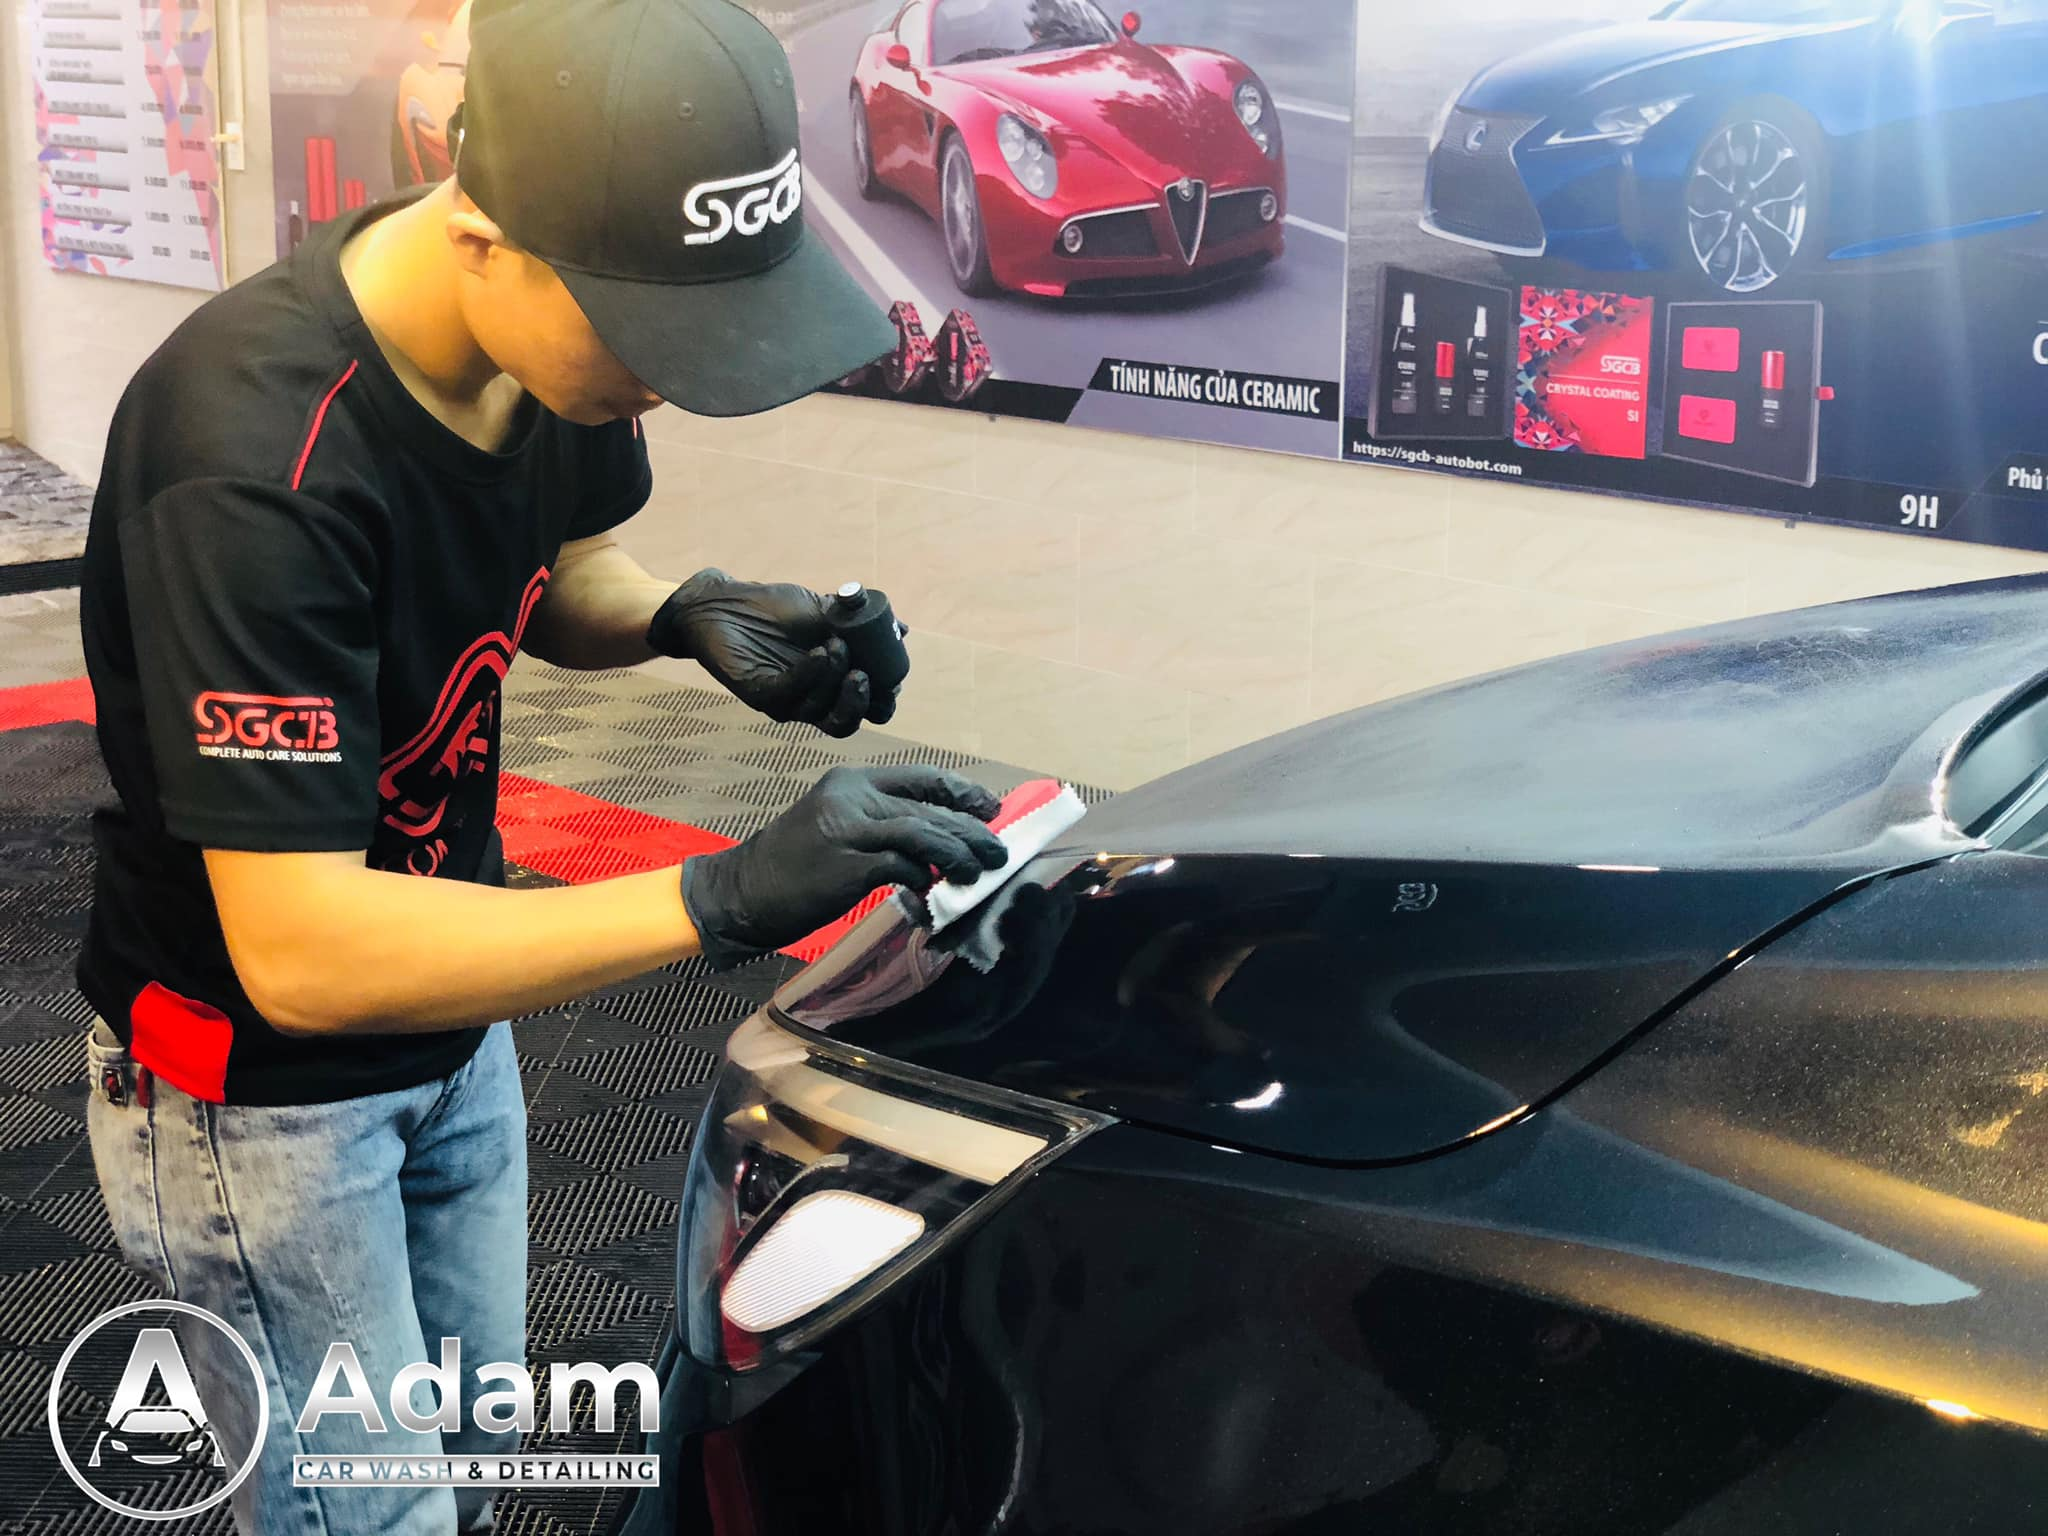 adam-car-wash-detailing-dai-ly-sgcb-khu-vuc-go-vap-2